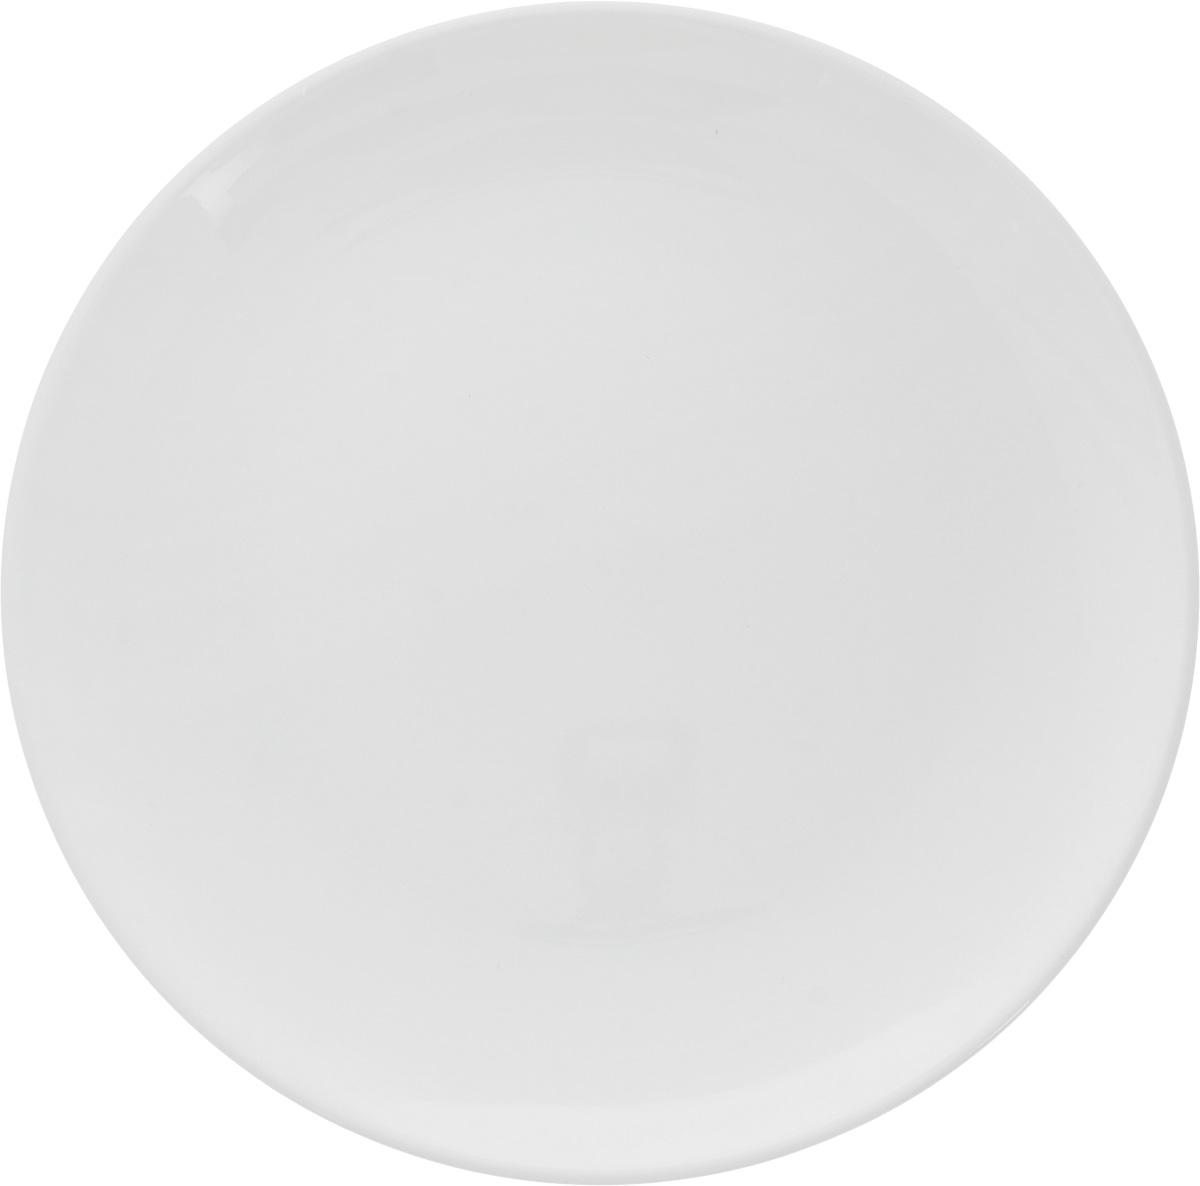 Тарелка Ariane Коуп, диаметр 21 см. AVCARN11021